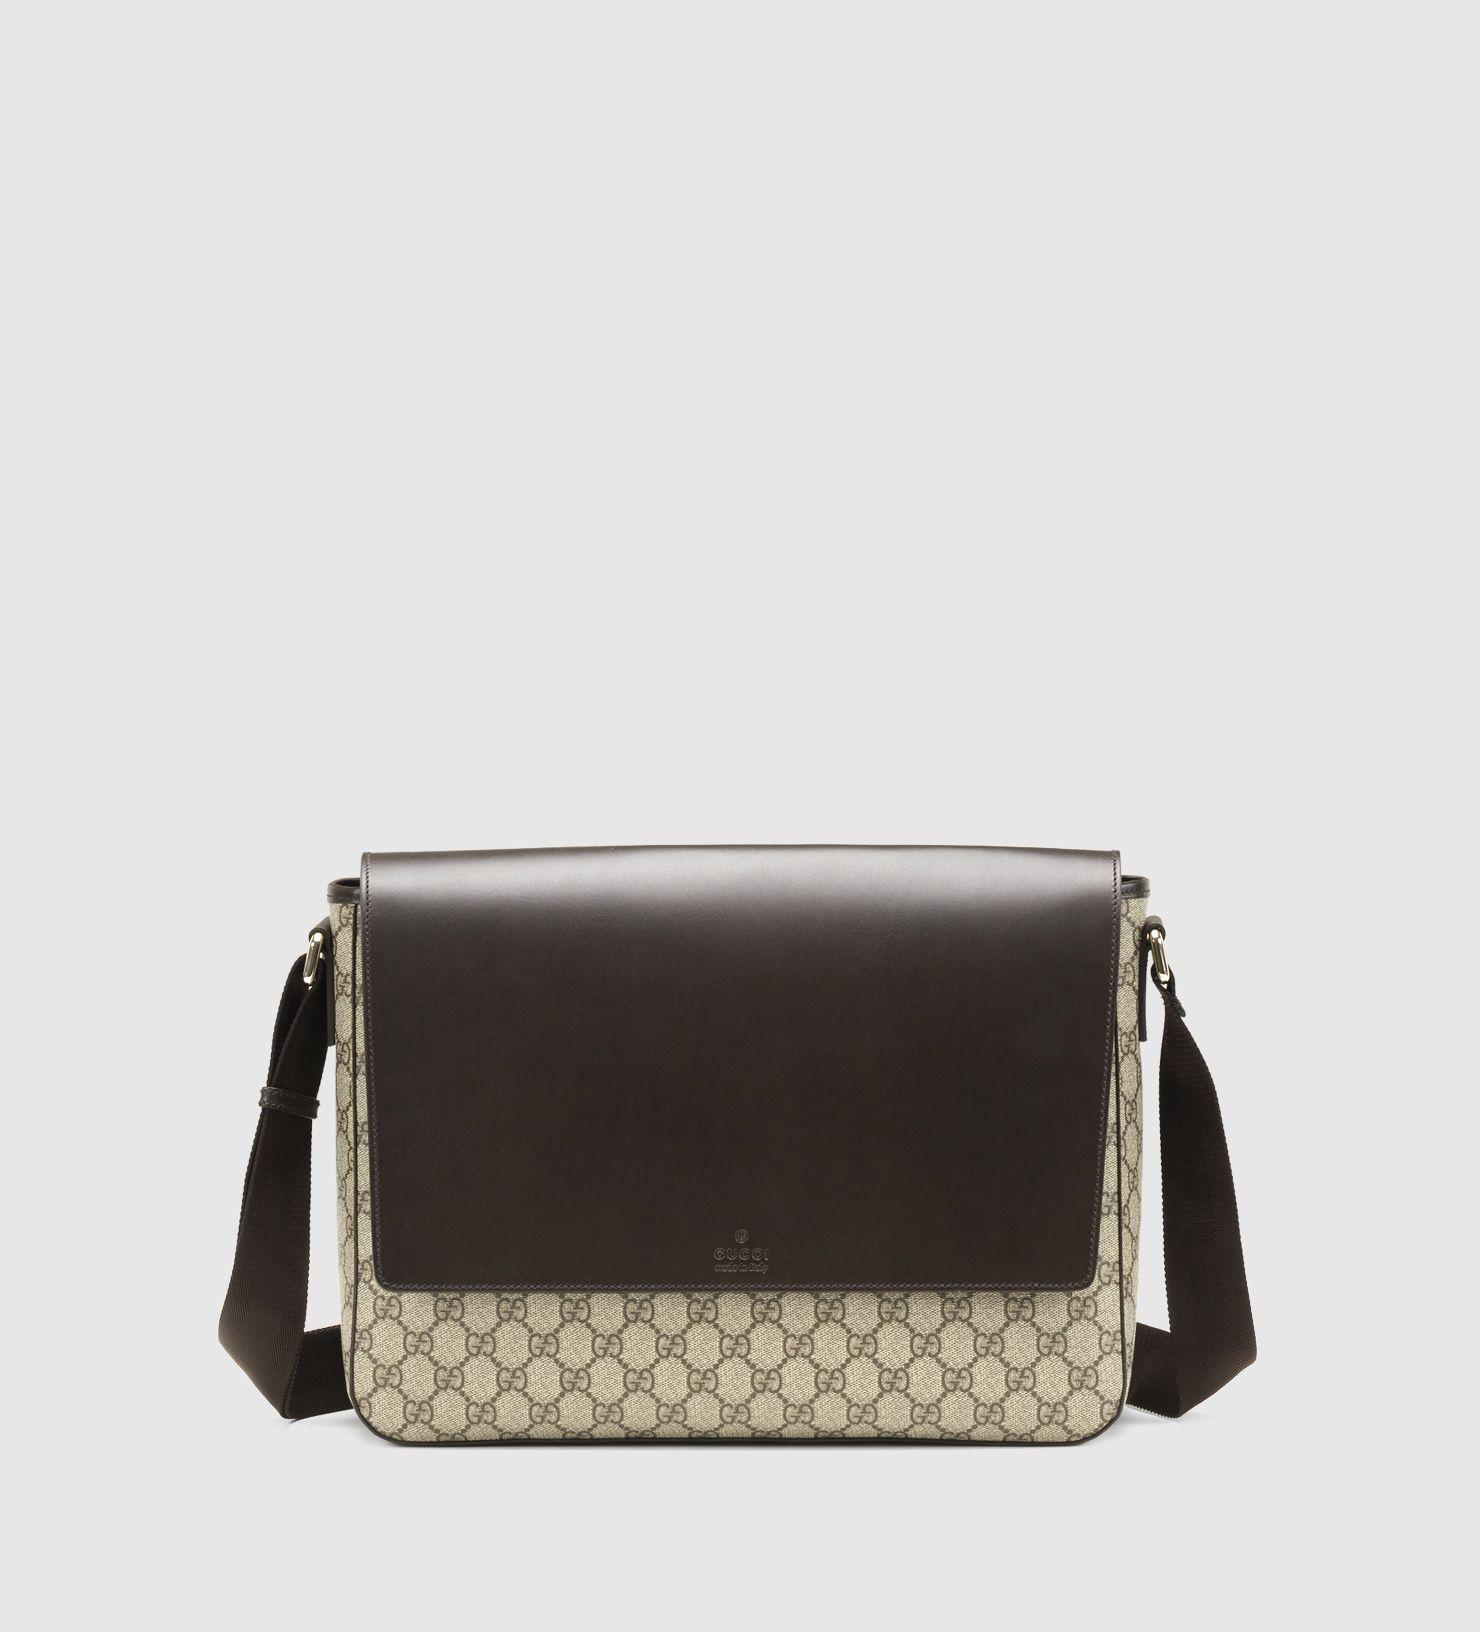 ce5db6064b88 Gucci - GG supreme canvas messenger bag 353433KGDIG8588   Unlimited ...